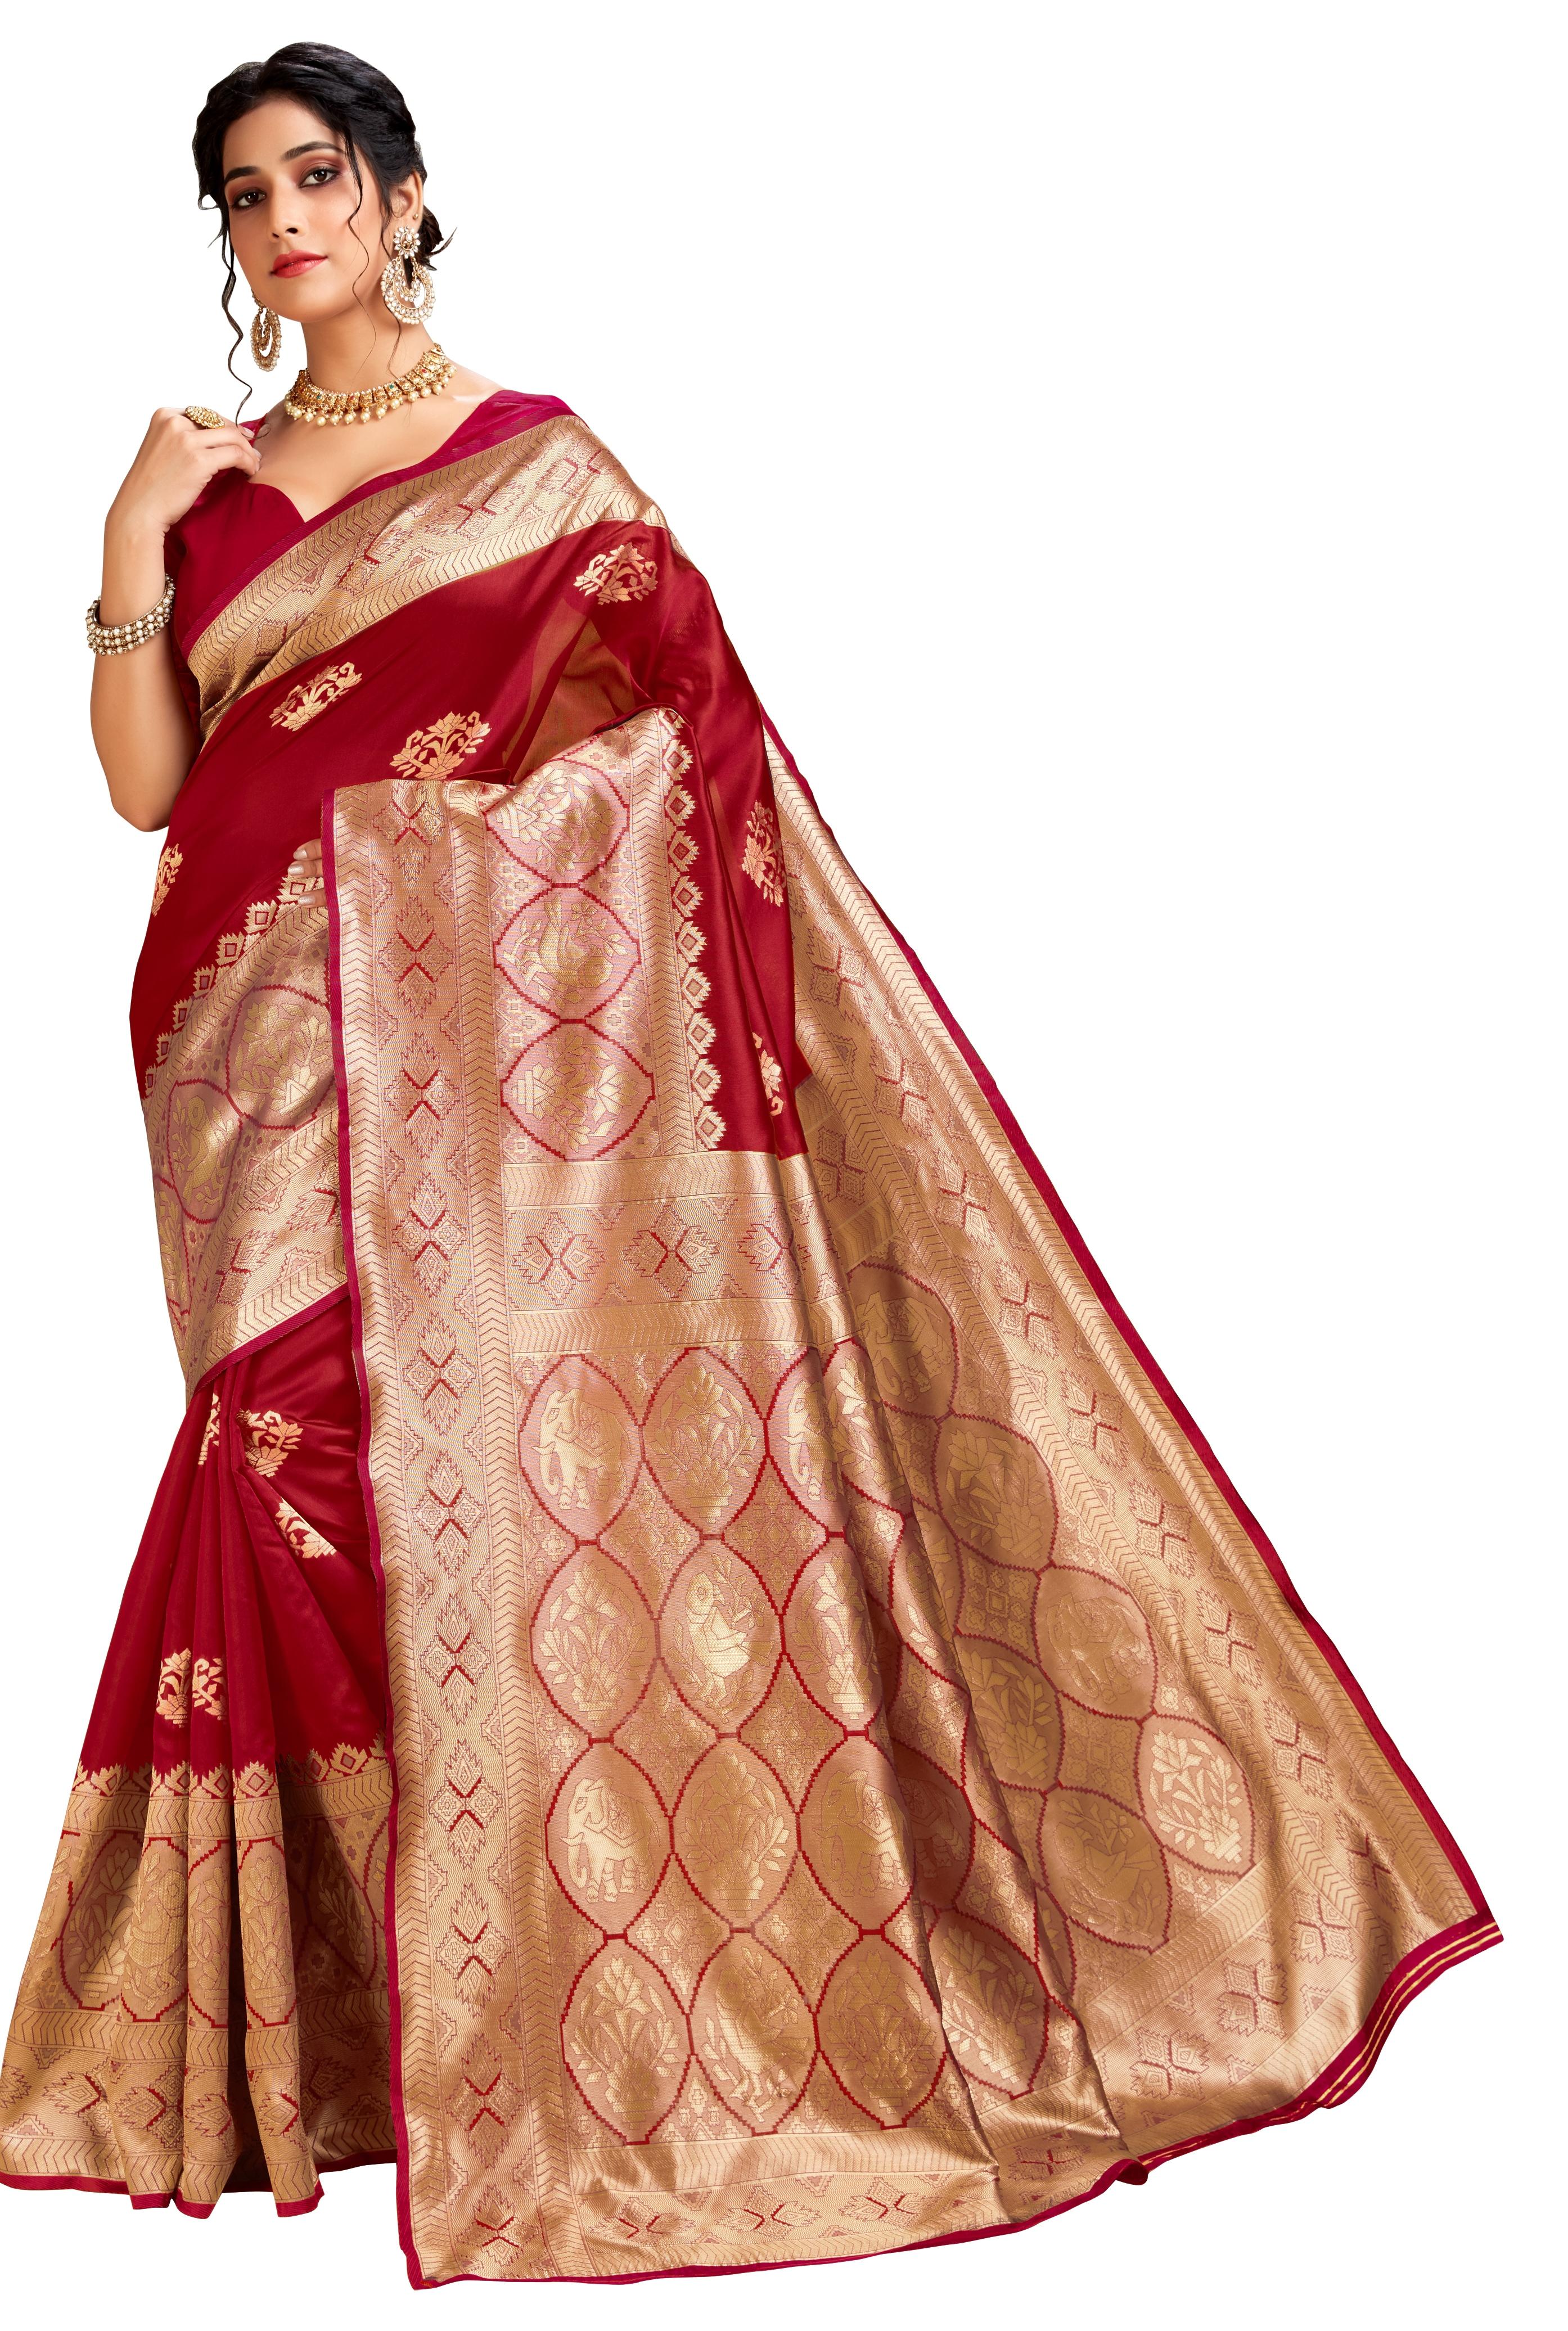 Glemora | Glemora Red Lichi Cotton Ekaya Saree With Unstitched Blouse